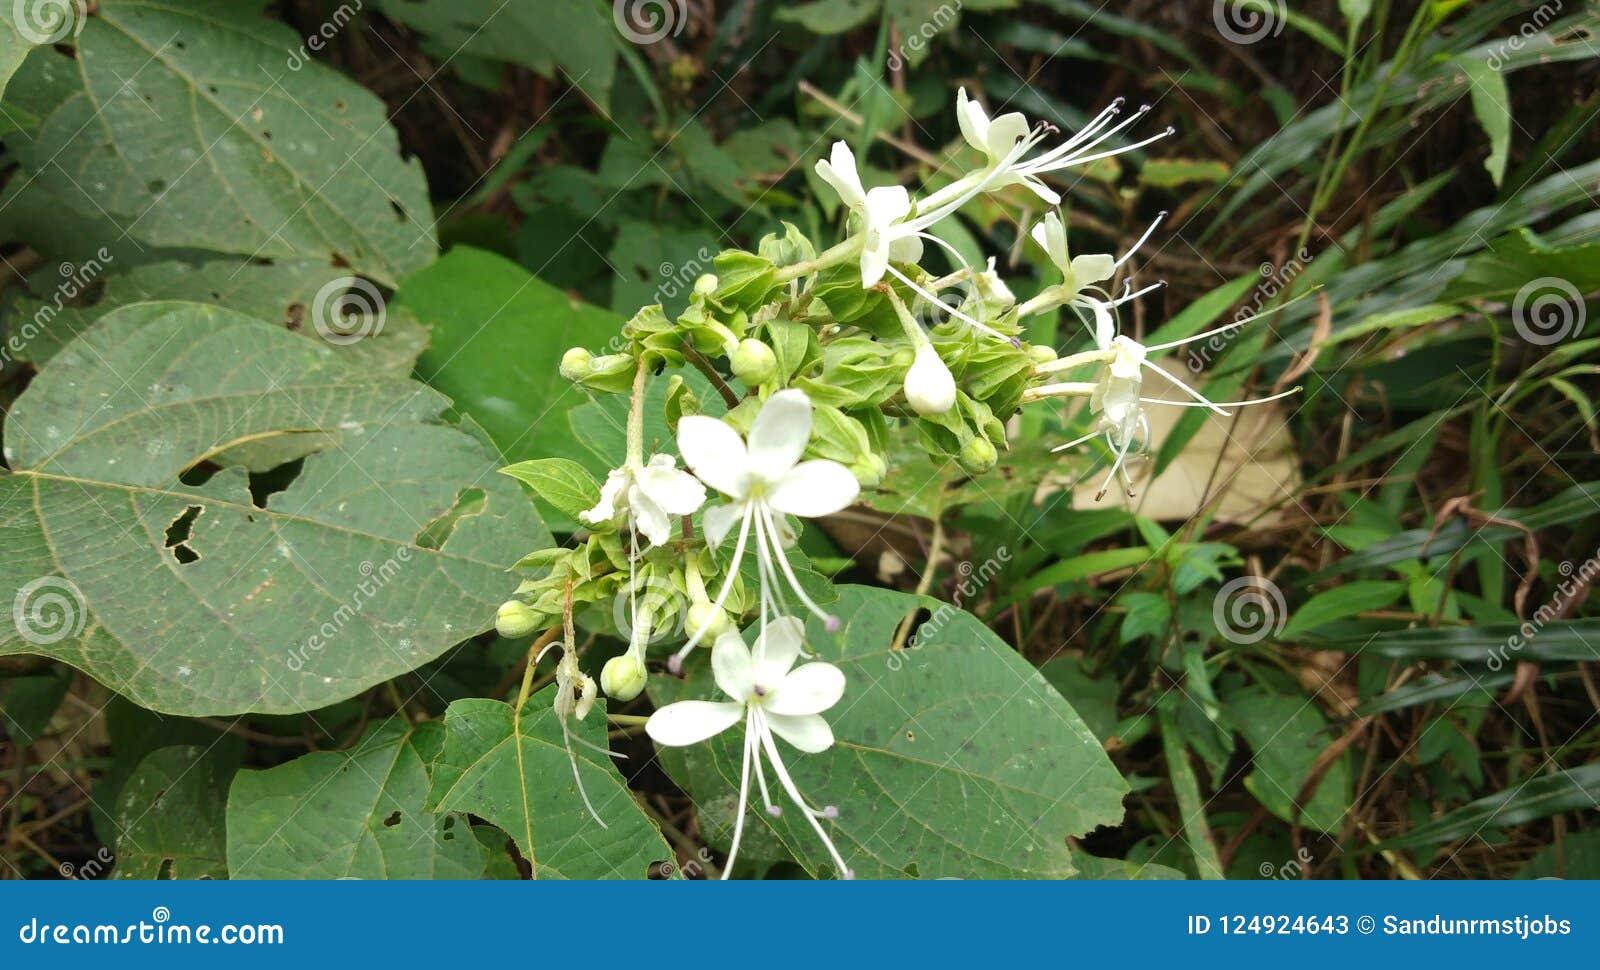 Download Beautiful Flowers In Sri Lanka Stock Image Image Of Bodhi